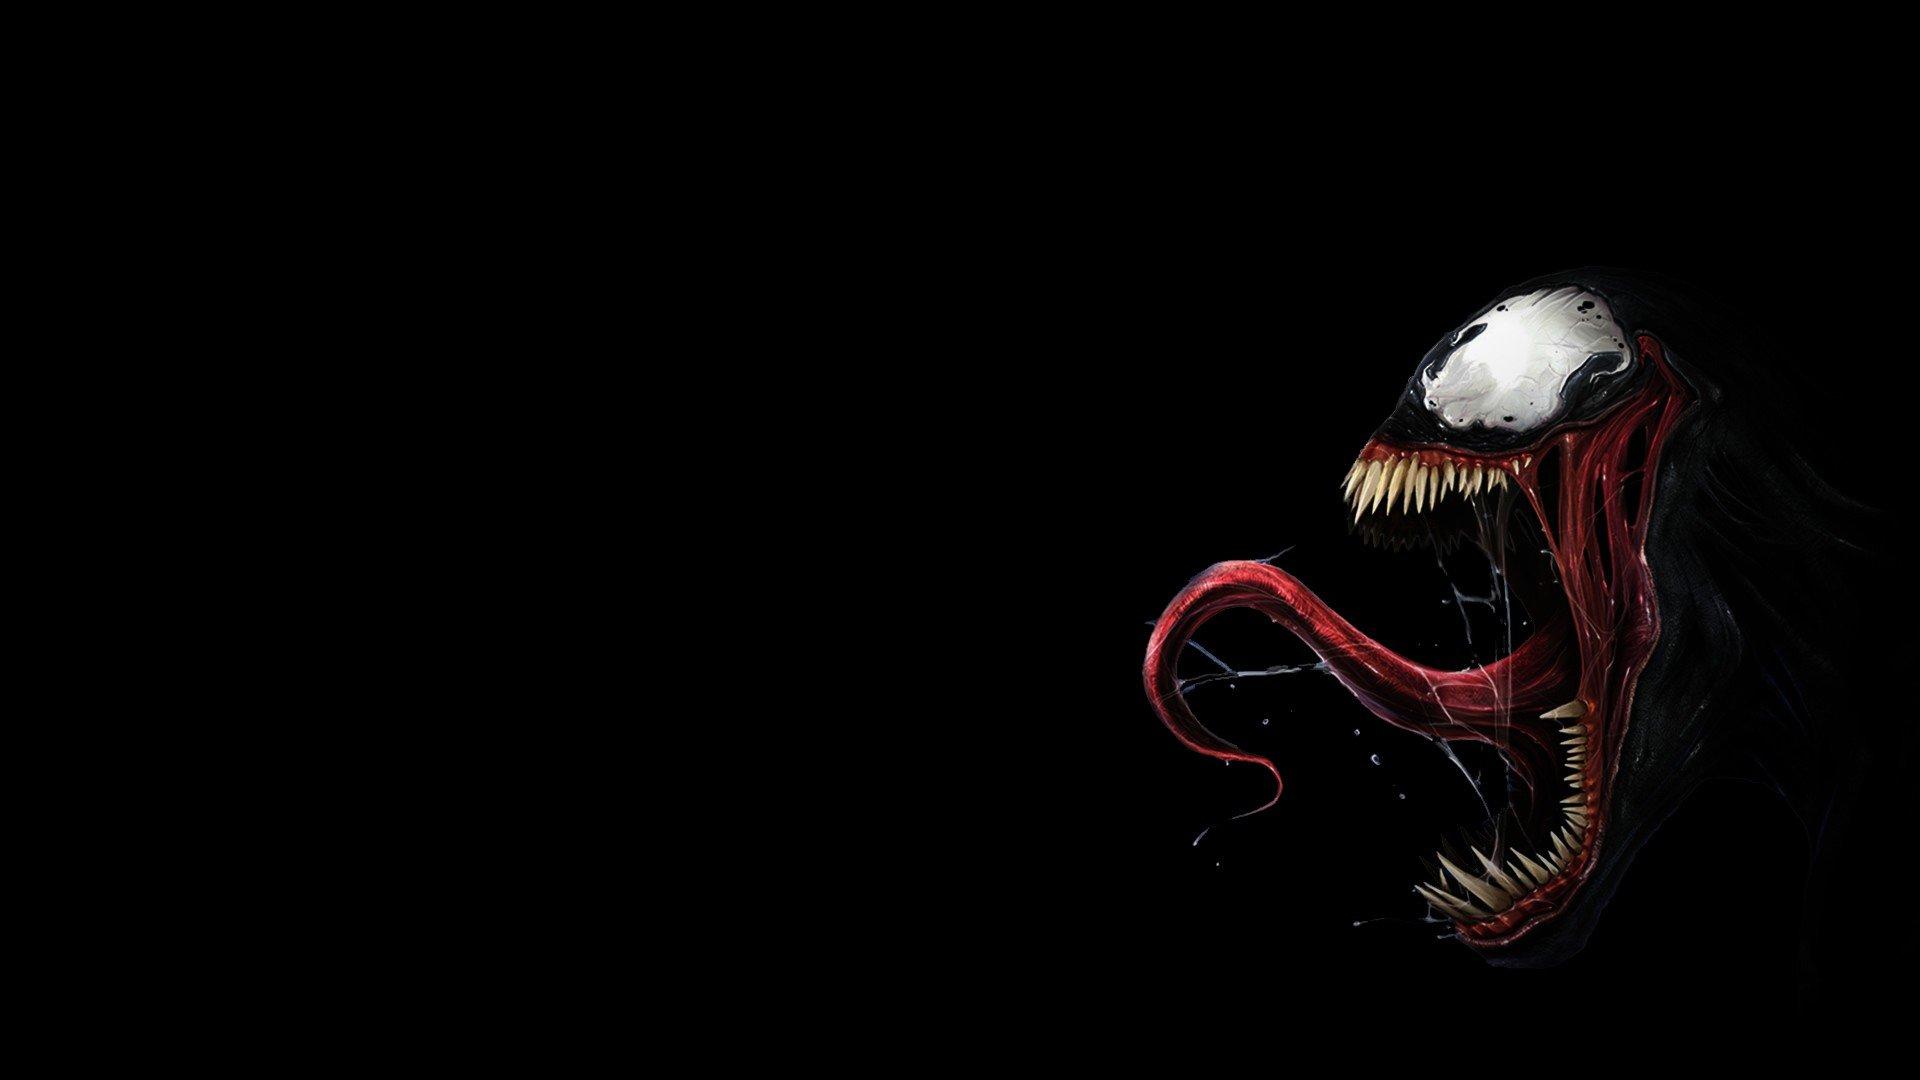 Spiderman Venom Wallpaper Hd Download Tingcoter62 Montana